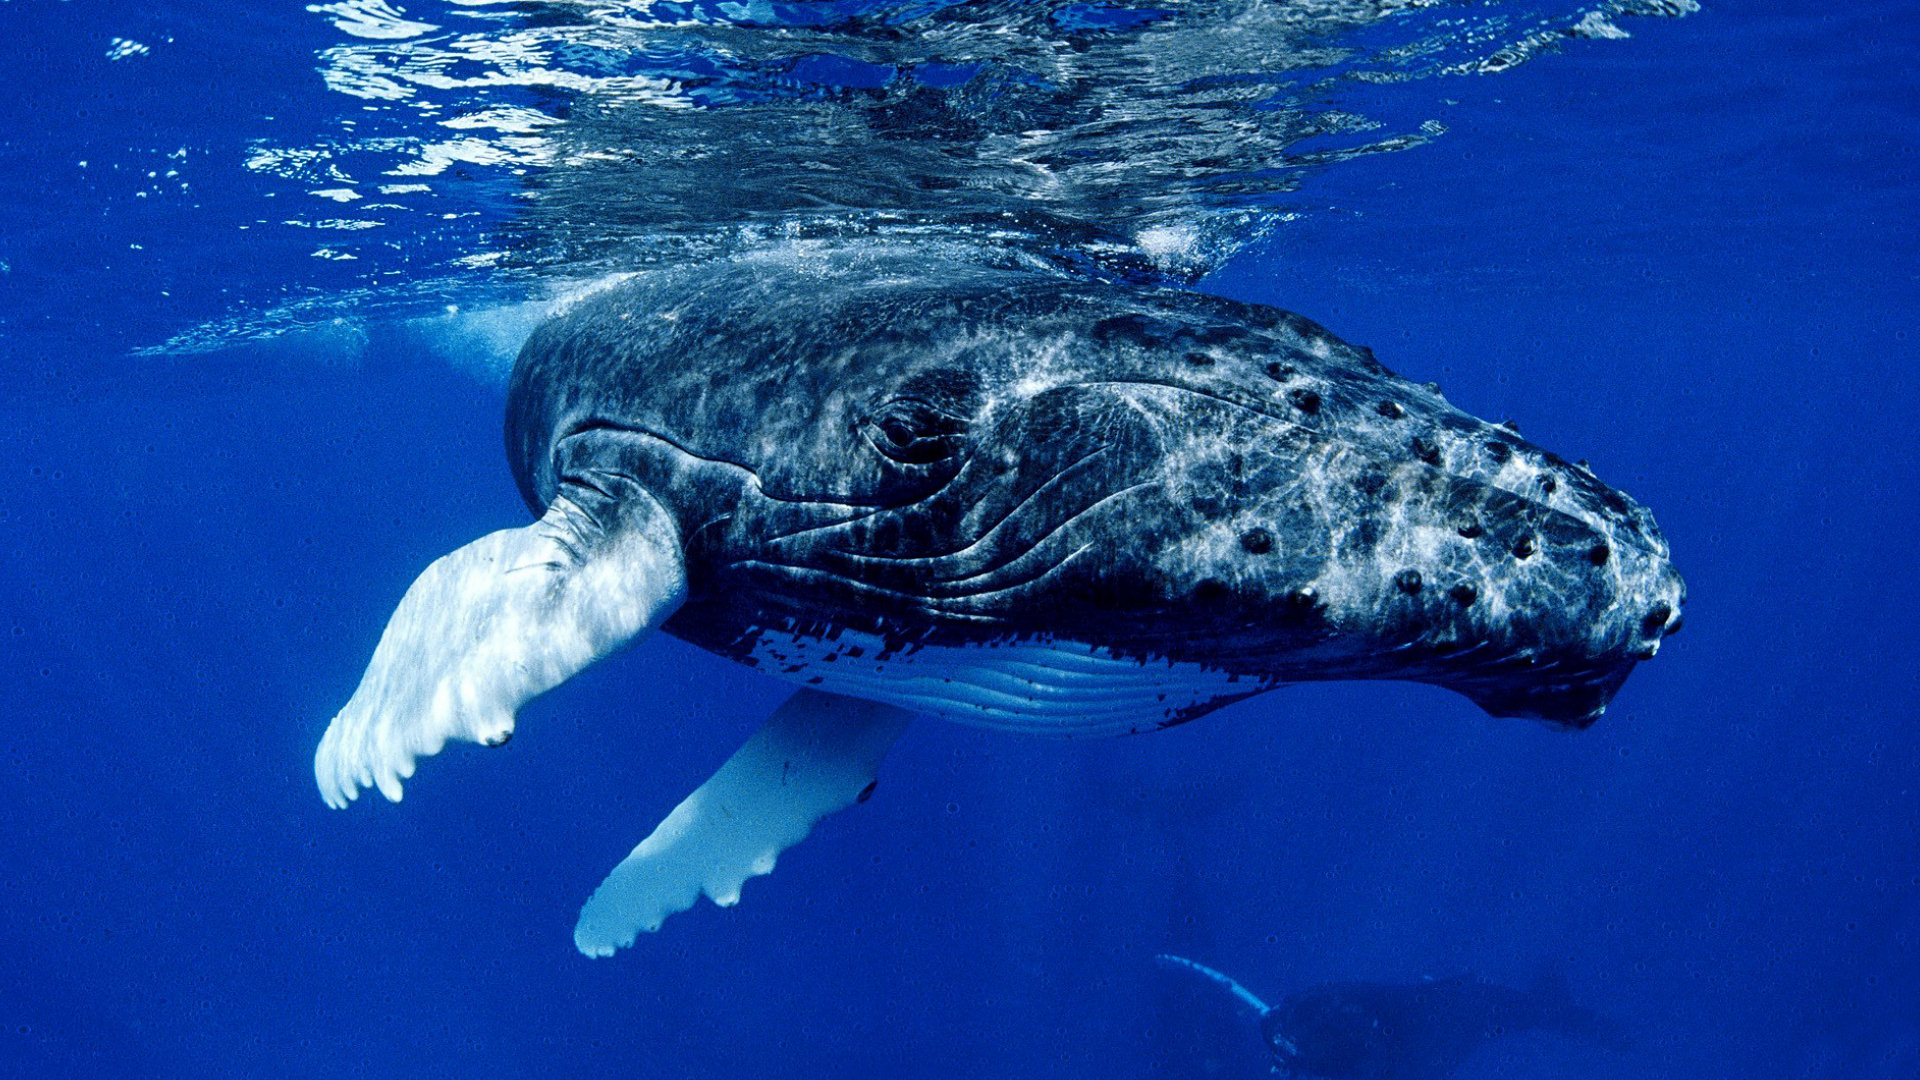 Amazing Whale Wallpaper